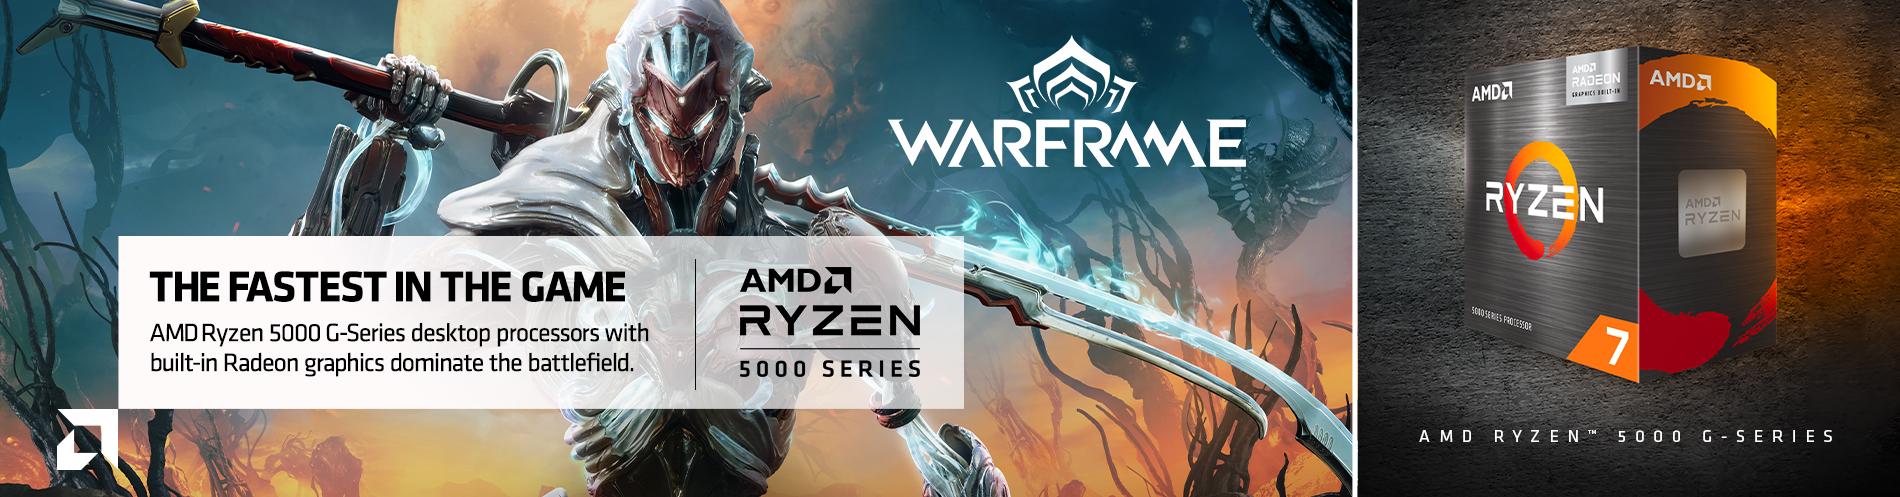 AMD  Gseries Warframe 08.02.warframe Banner